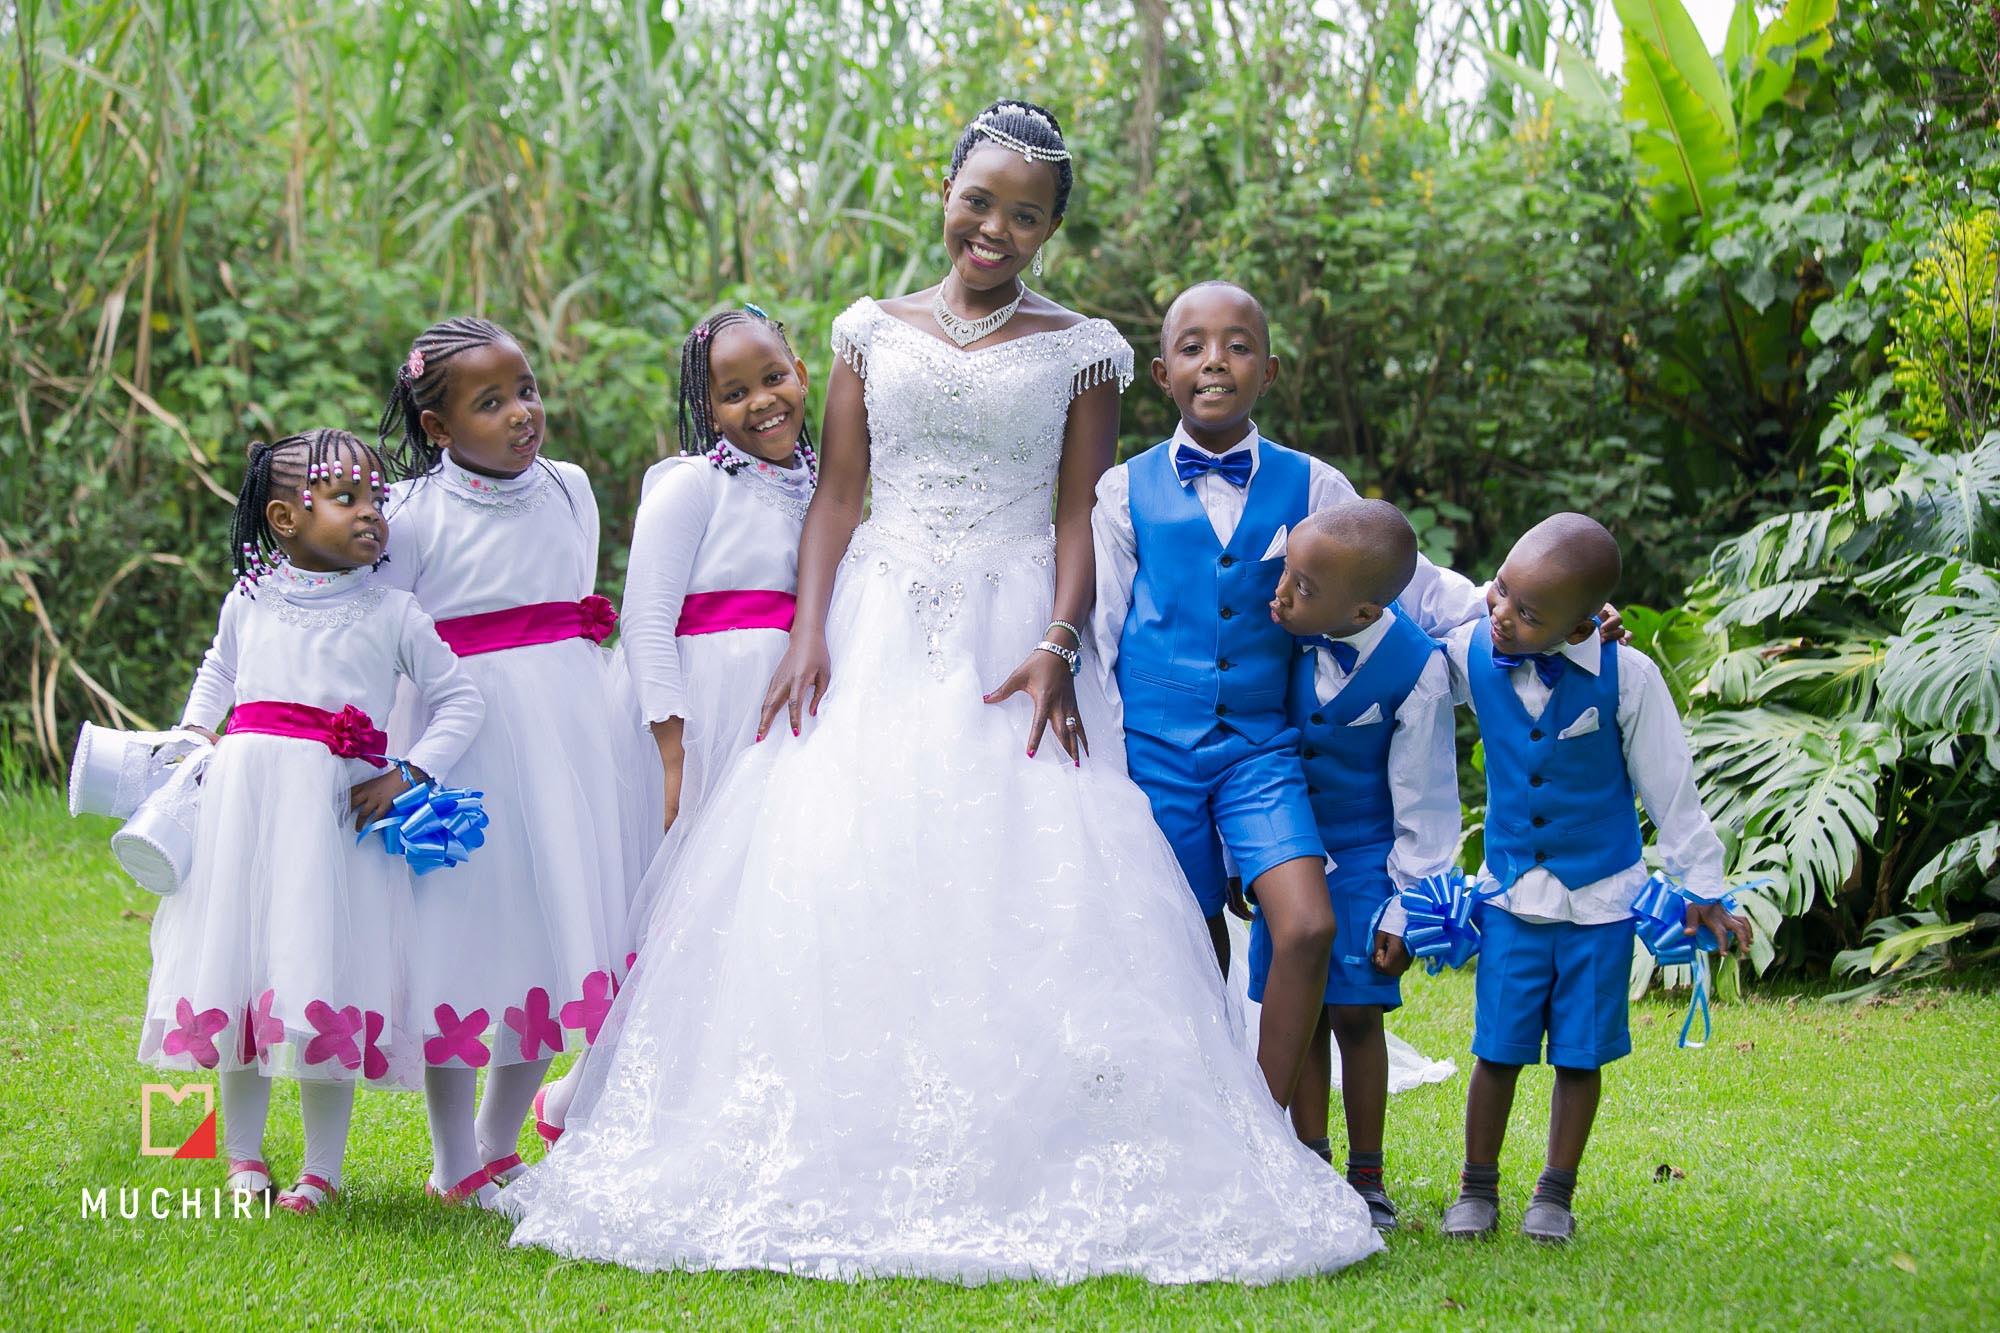 Kenyan Bridal Party Dresses Down To Earth Bali